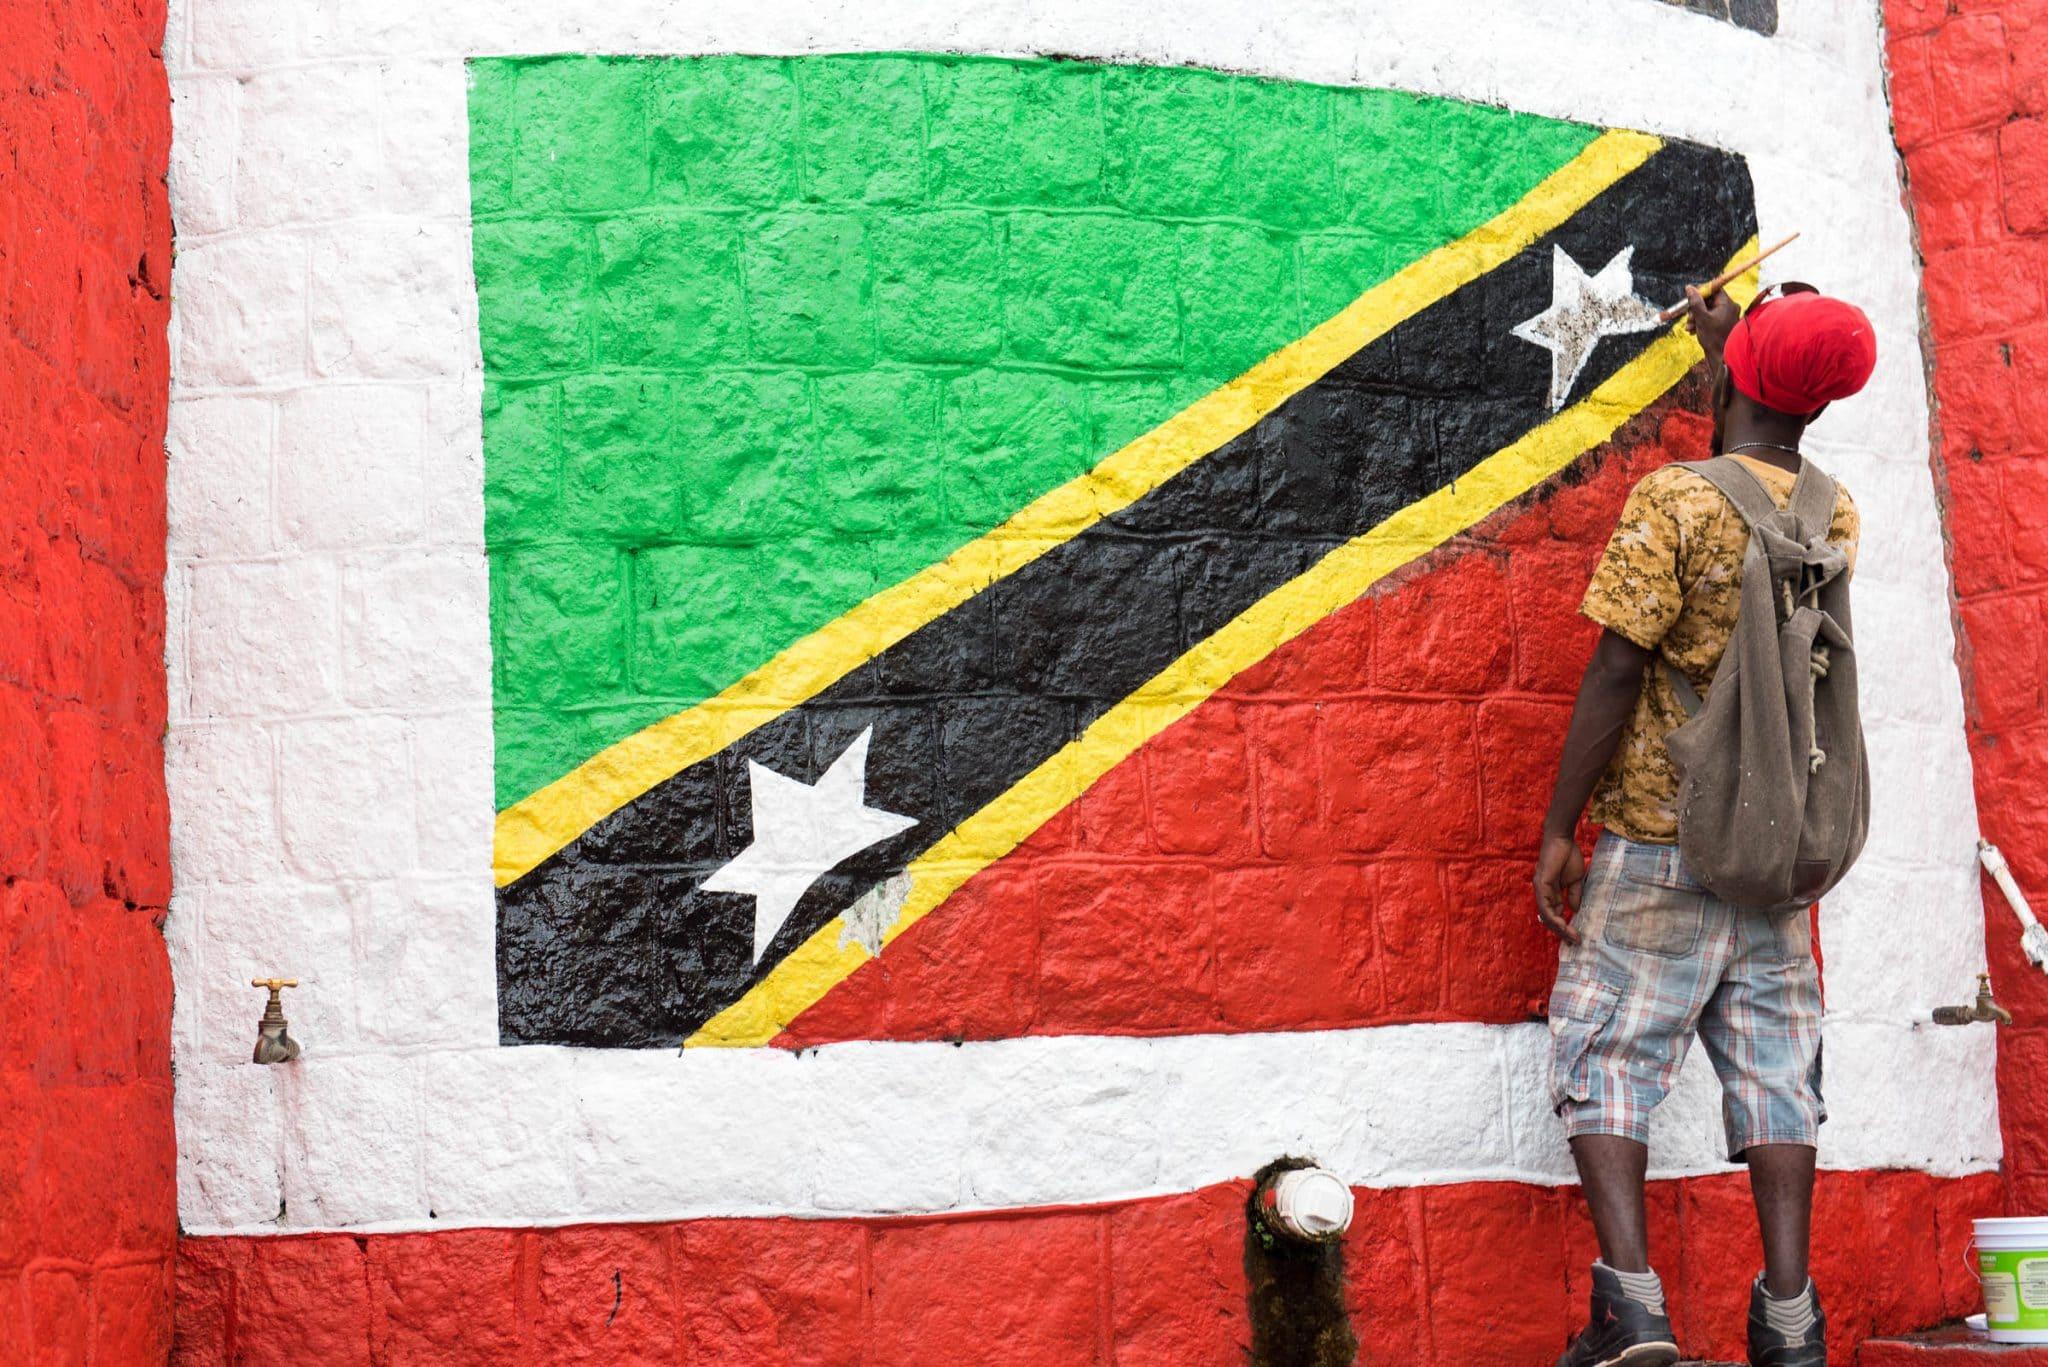 The Proud Flag of St. Kitts & Nevis